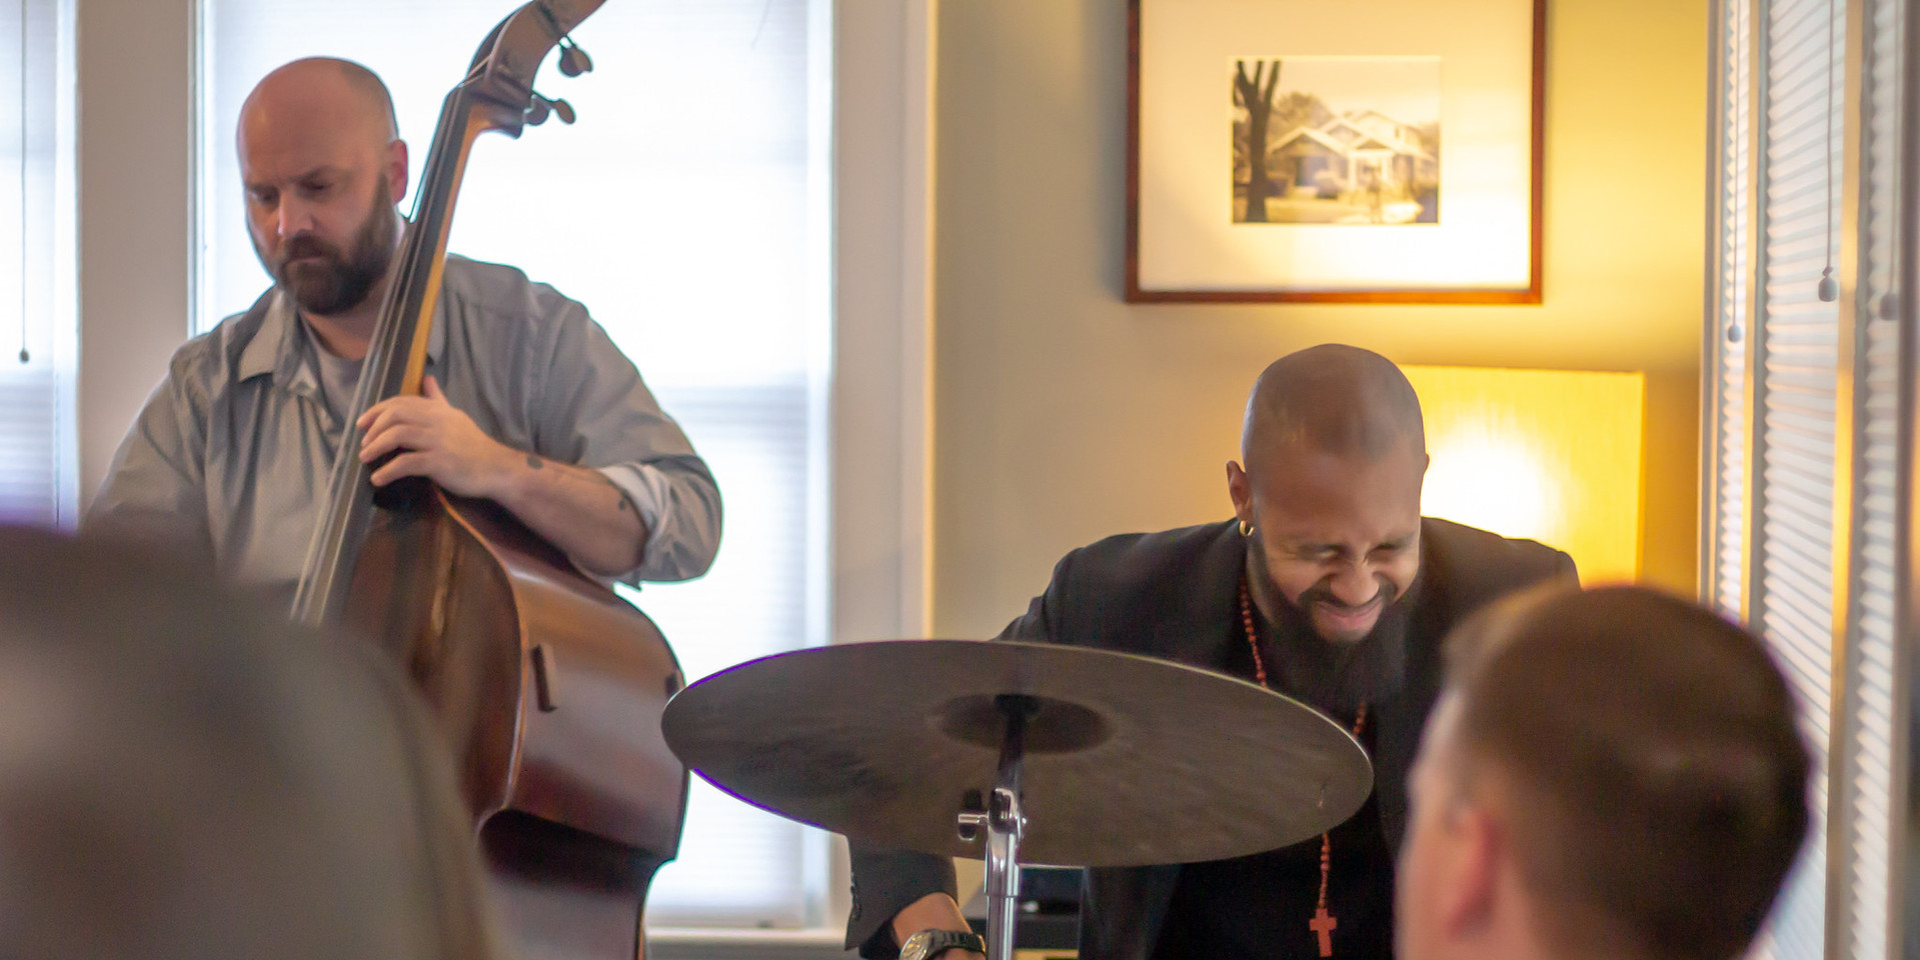 The Joshua Espinoza Trio performs